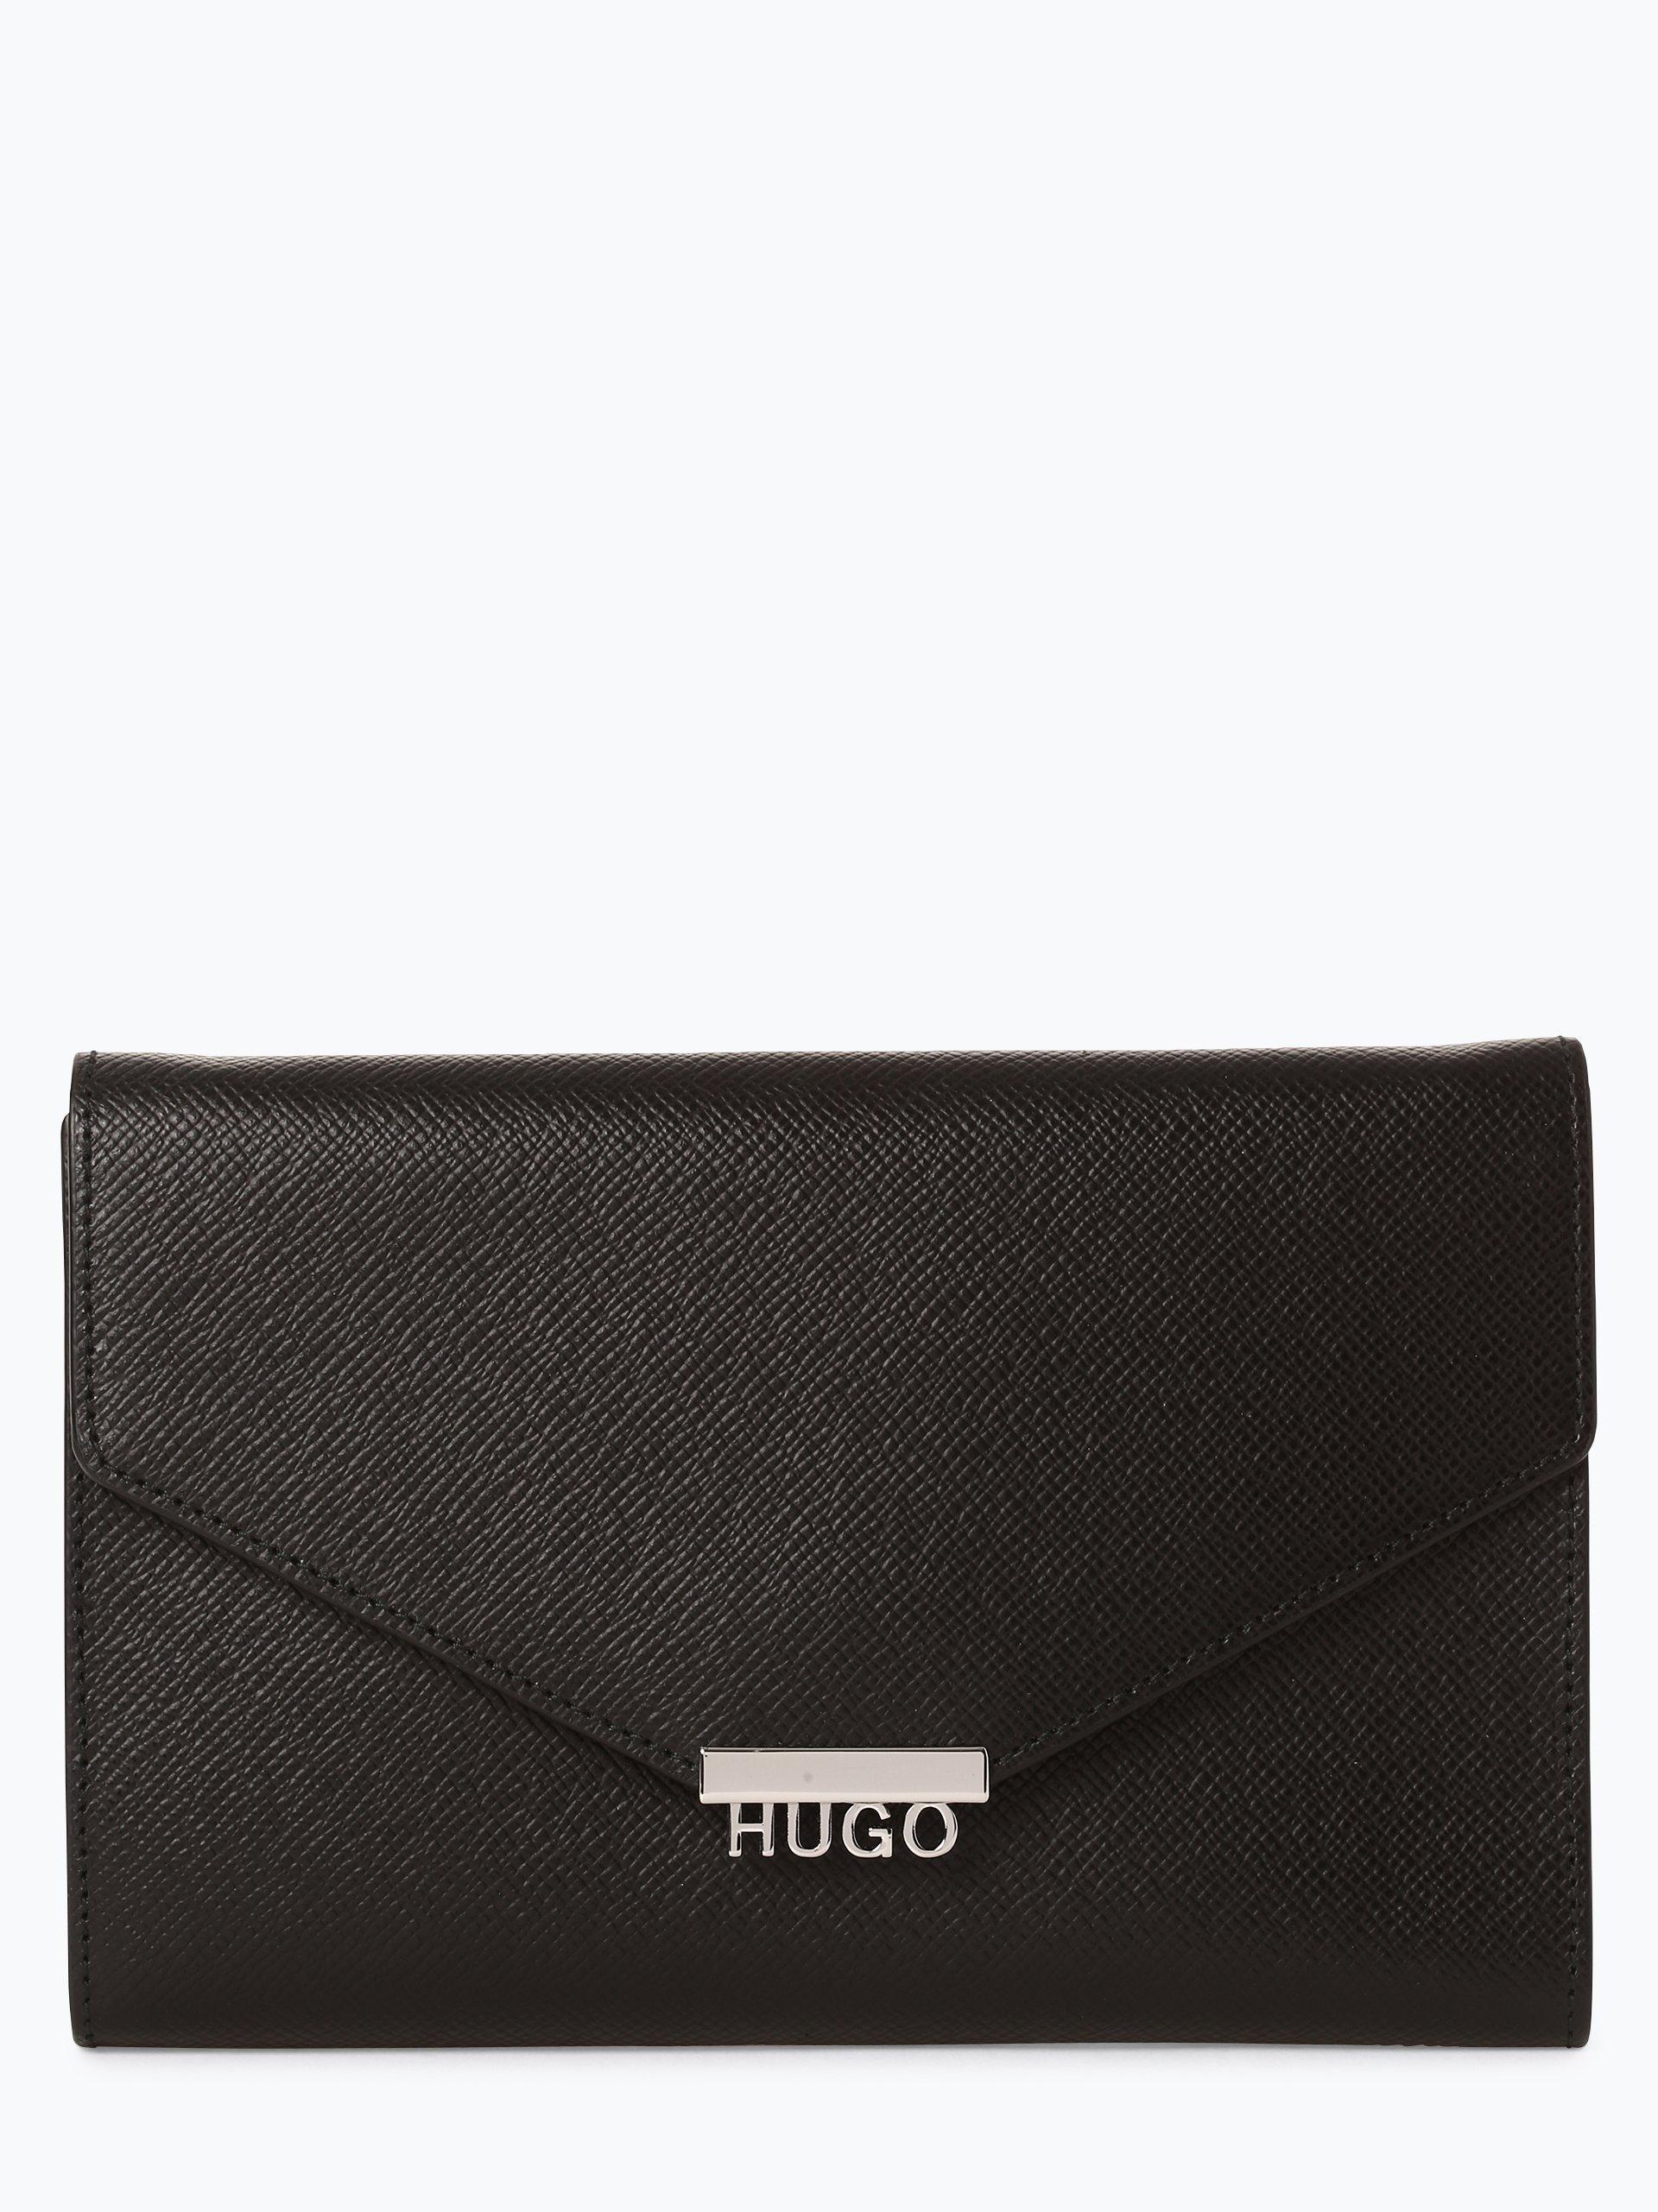 HUGO Damen Handtasche - Victoria Clutch